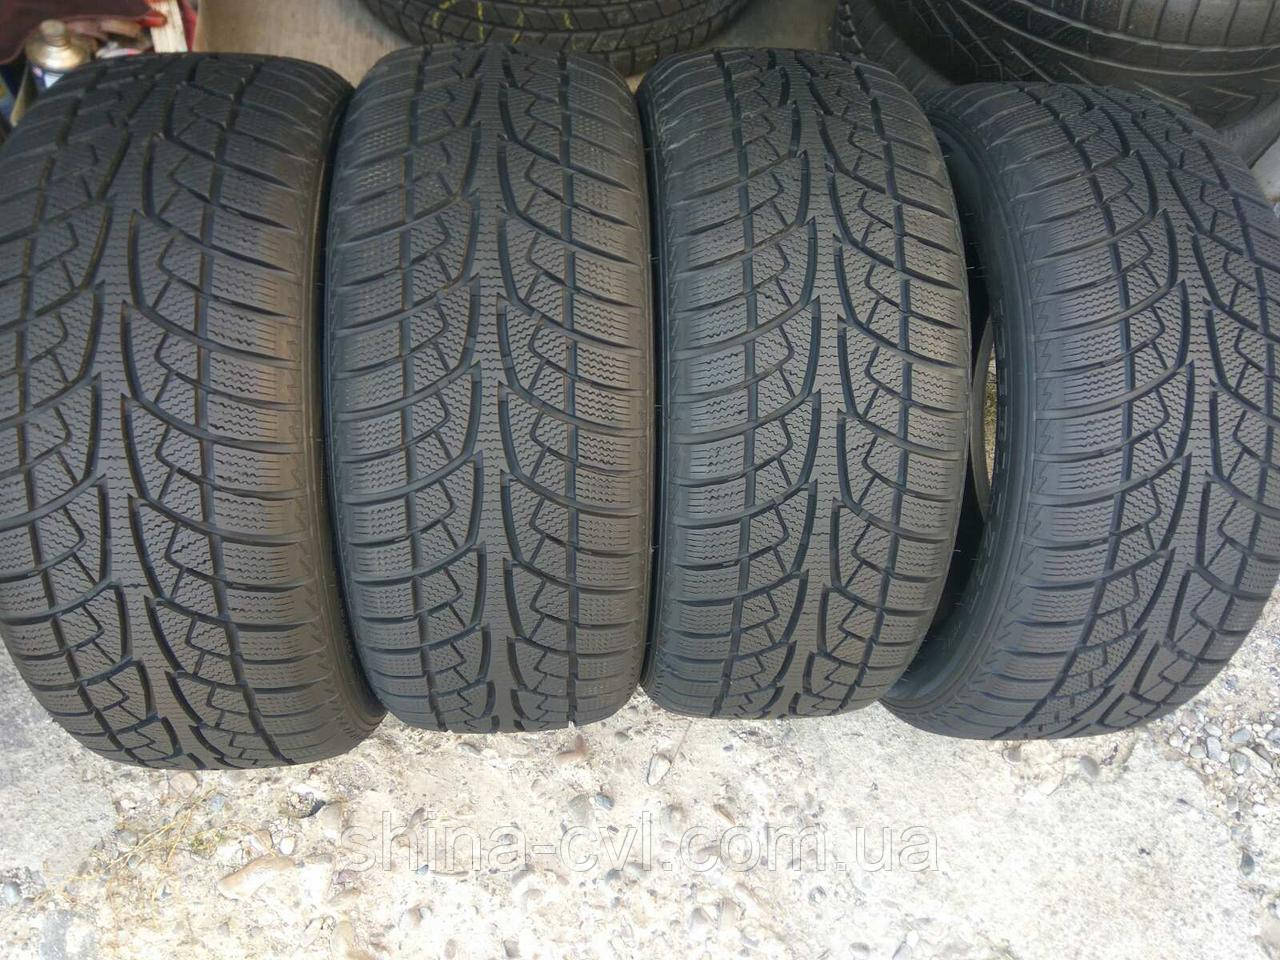 Зимові шини SAILUN ICEBLAIZER WSL2 225/50 R17 98H XL